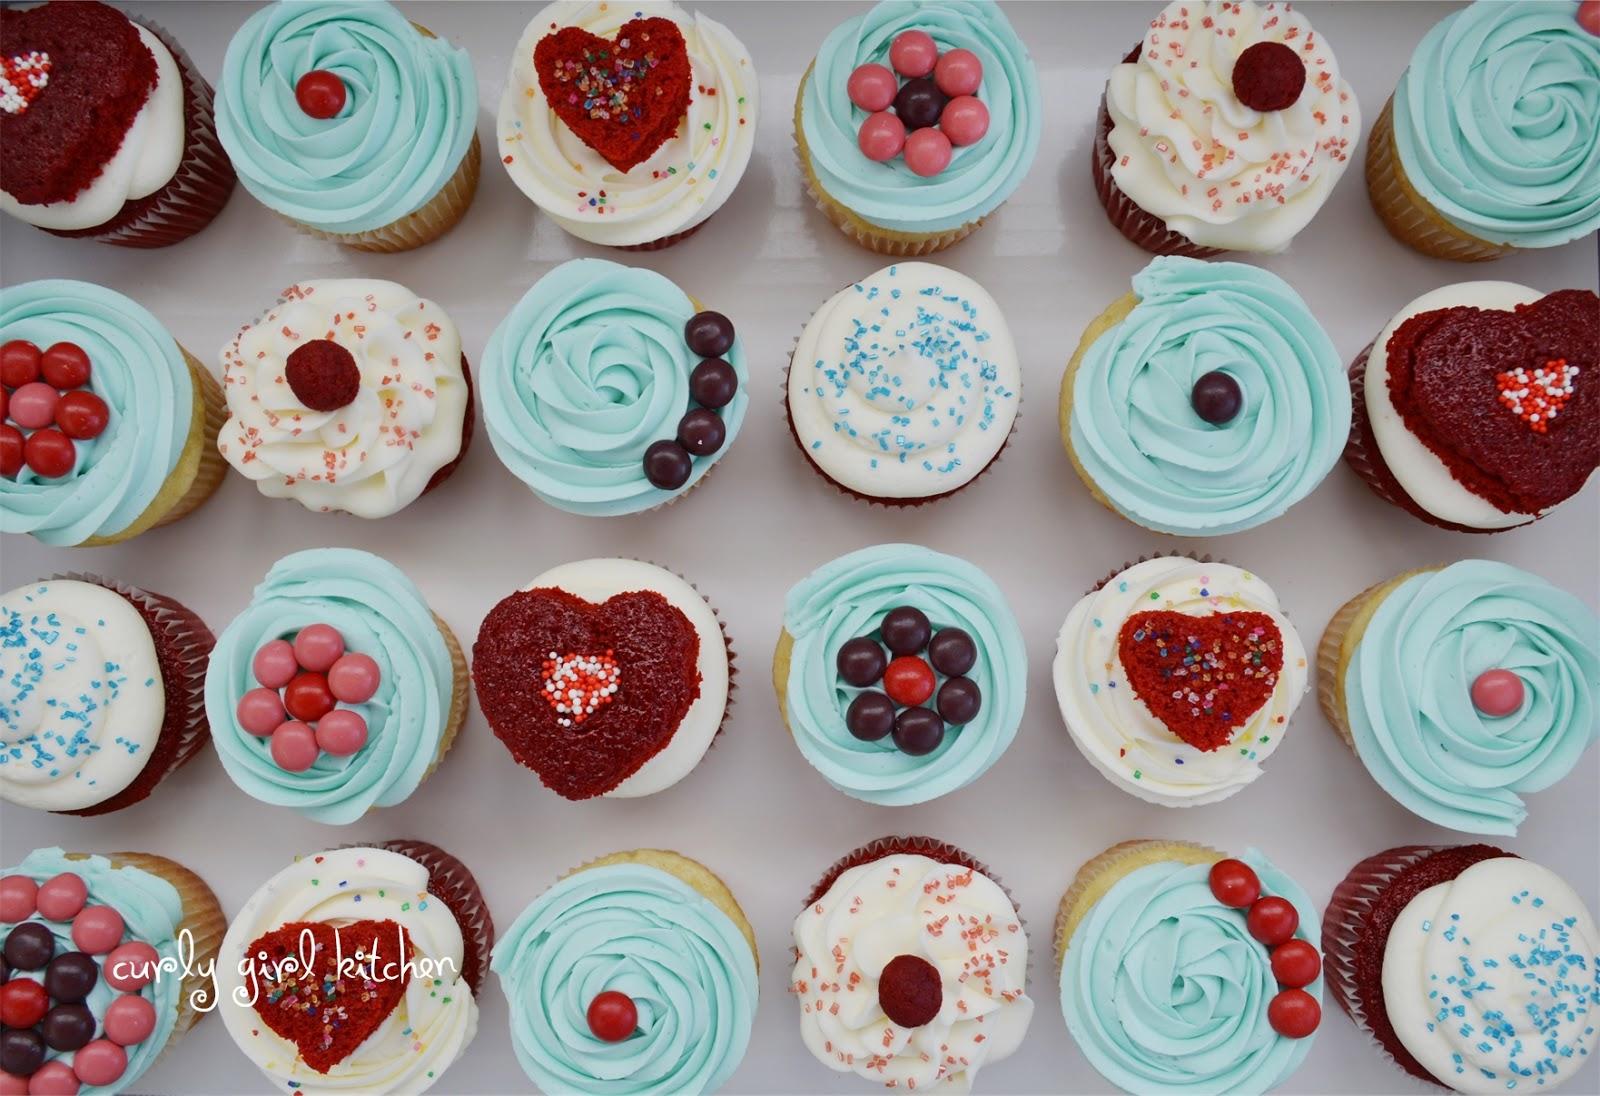 Cake Decorations Tunbridge Wells : Red Velvet Cupcakes With Frosting Car Interior Design